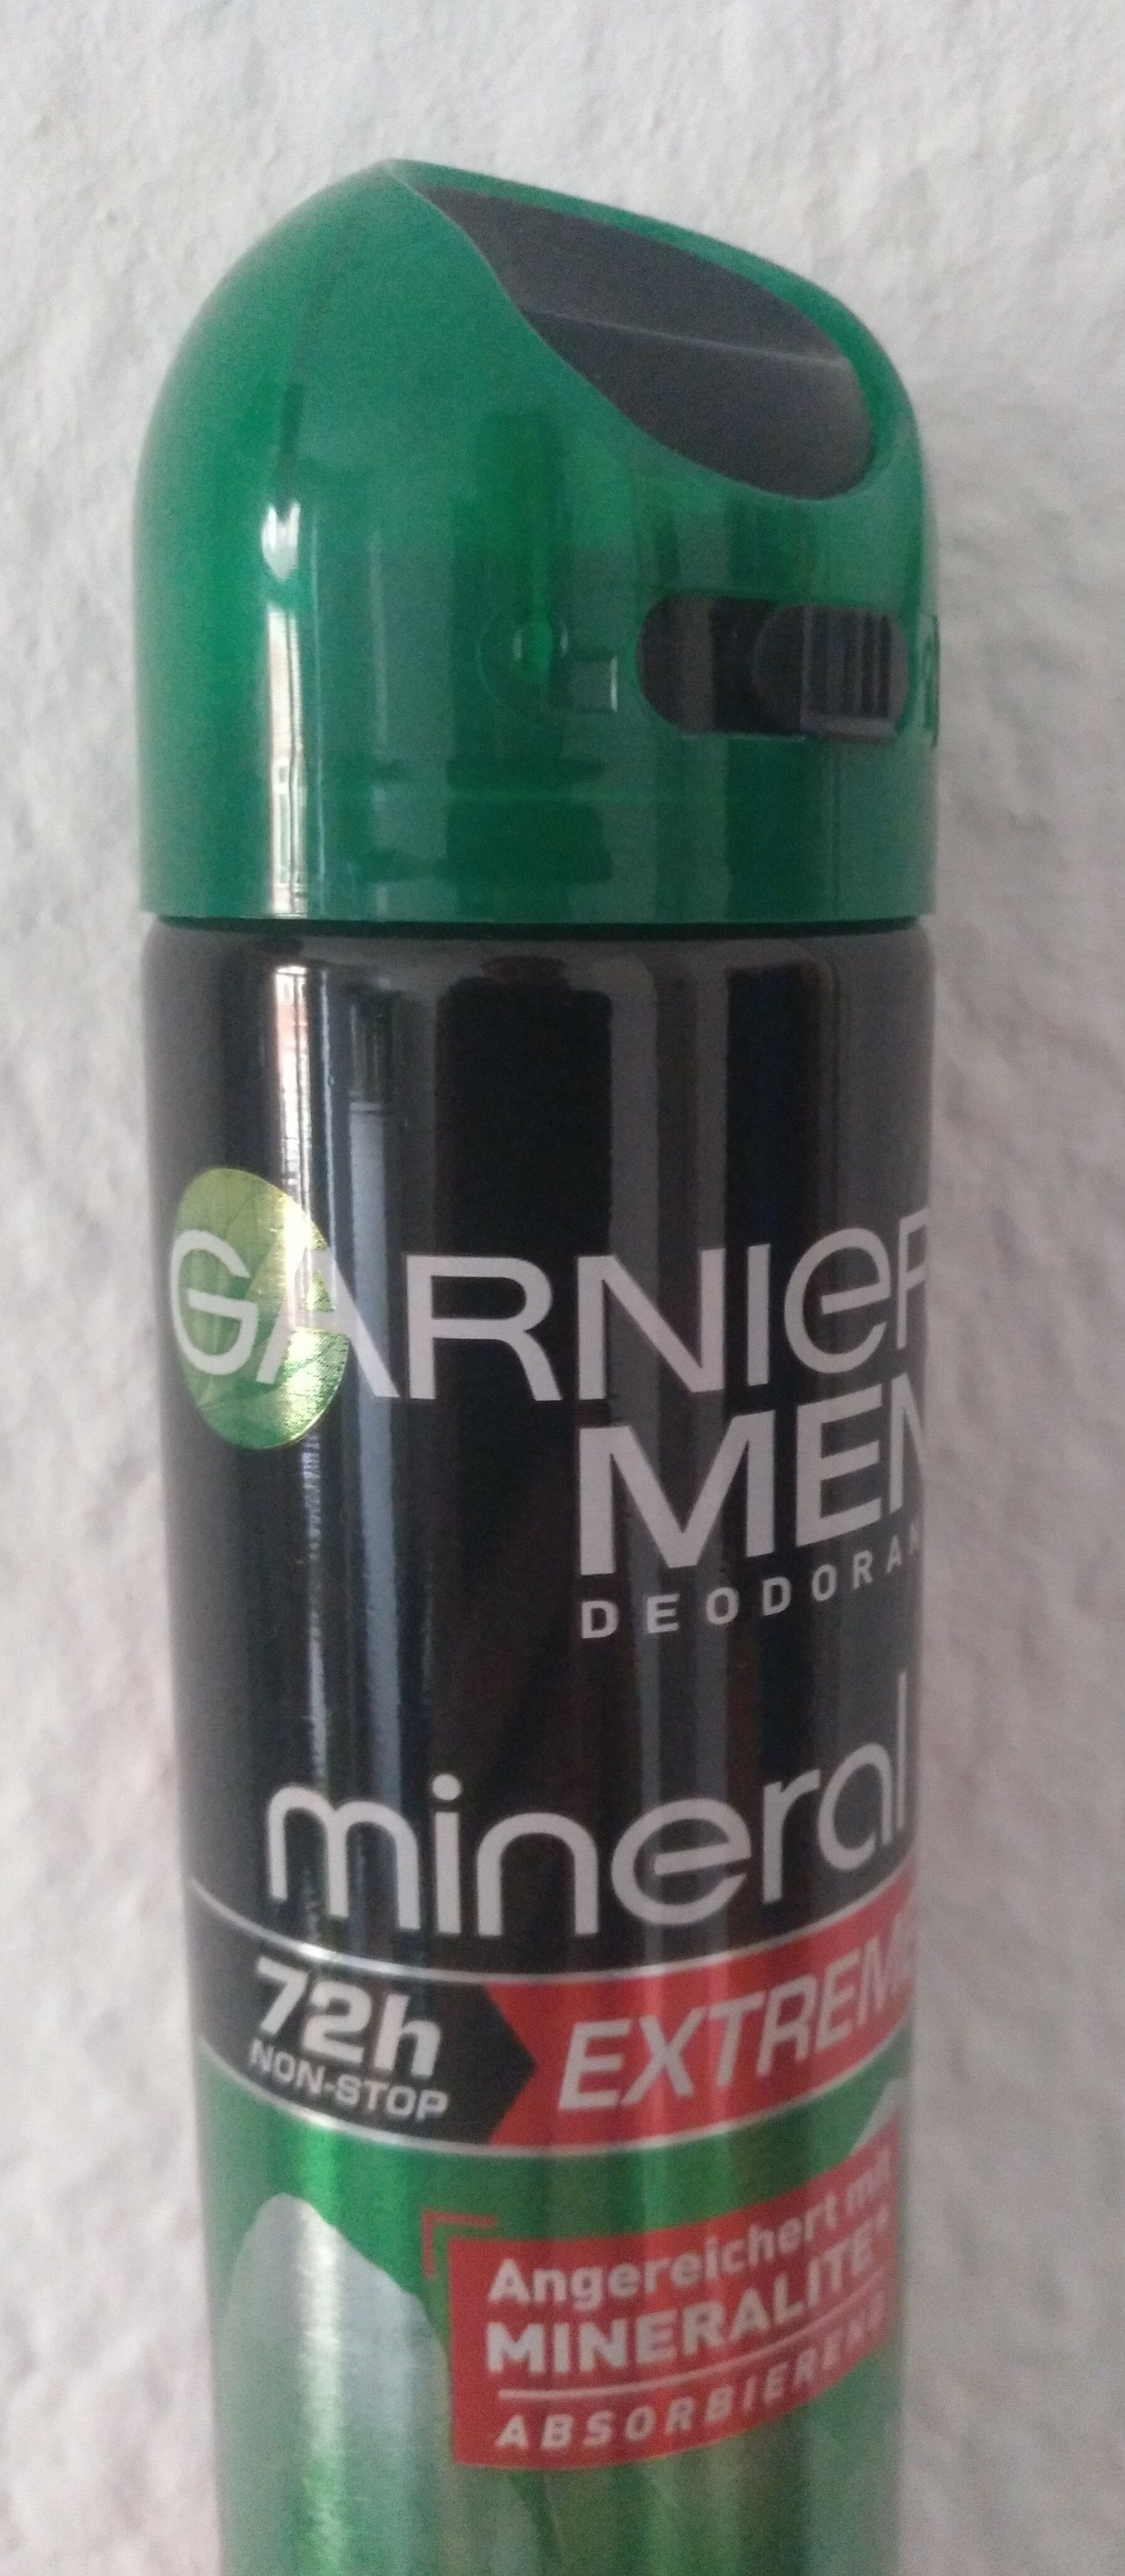 Garnier Men Deodorant mineral - Product - de